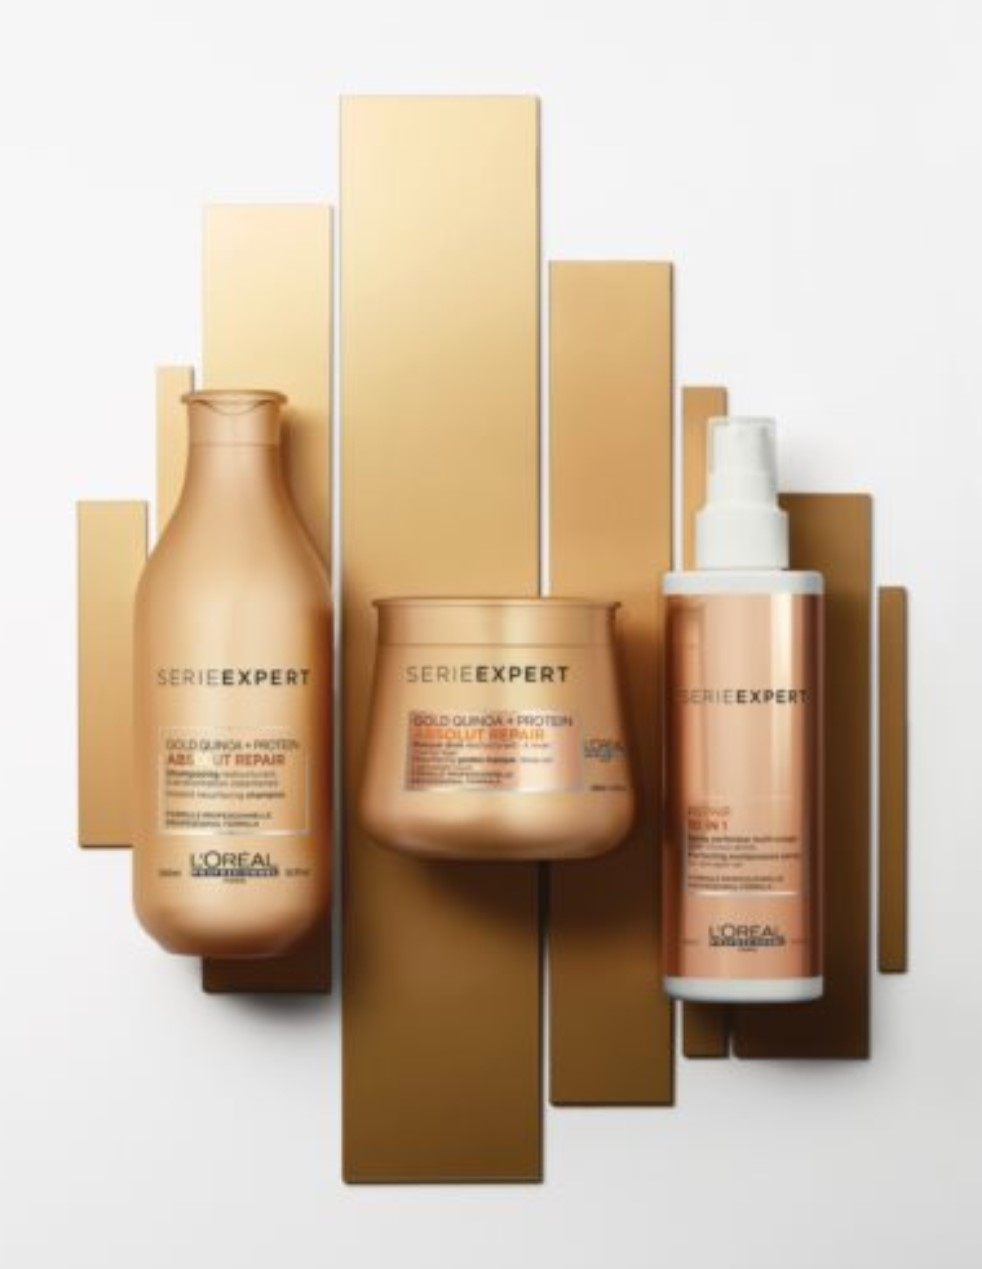 Gamme soins loreal série expert gold pour cheveux